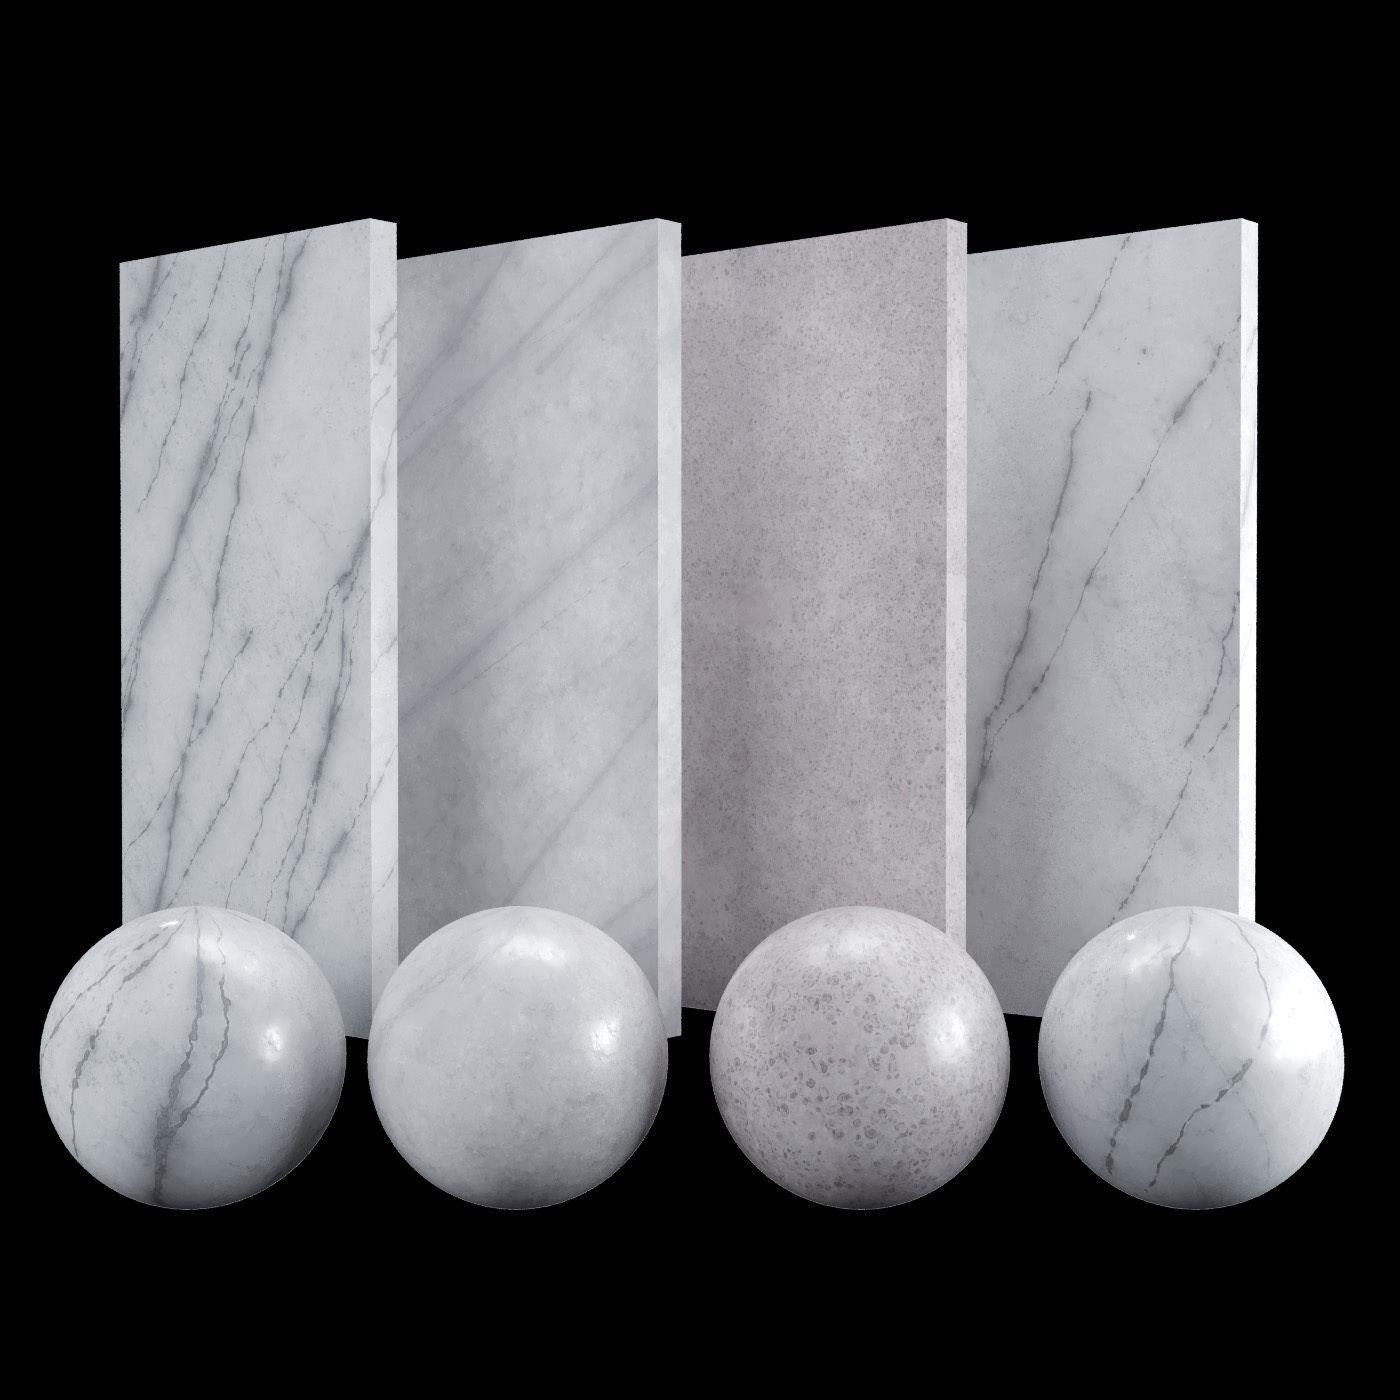 White Carrara 02 Marble Texture PBR Vray Corona 400 x 400 cm